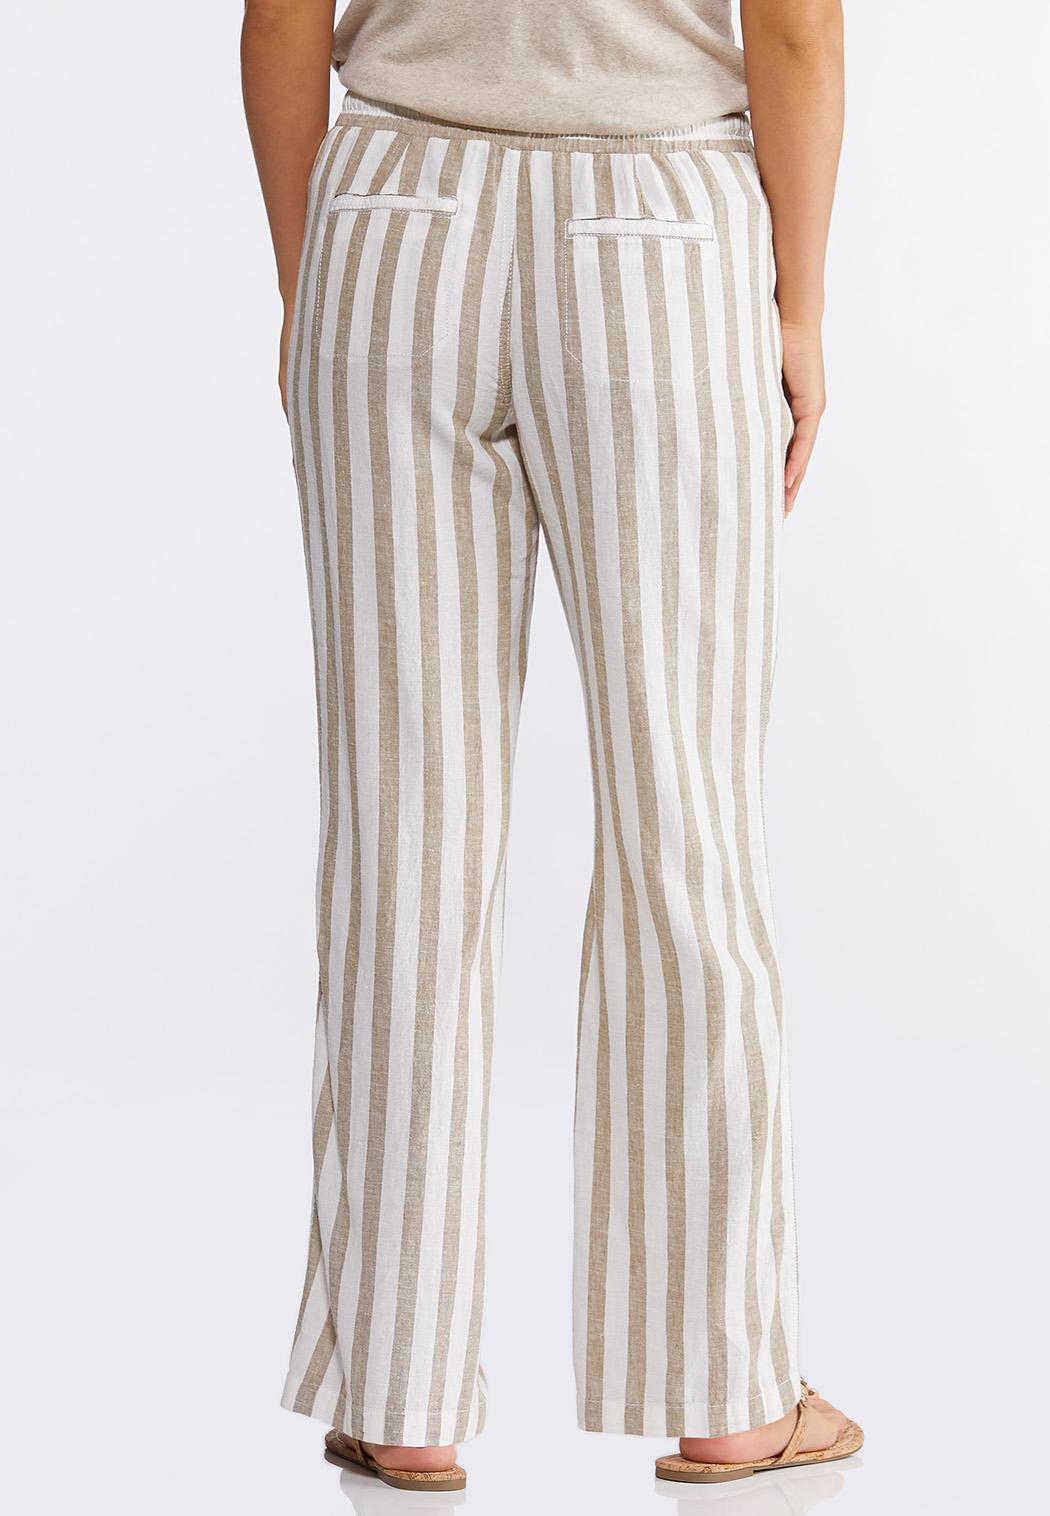 Striped Linen Drawstring Pants (Item #44257130)